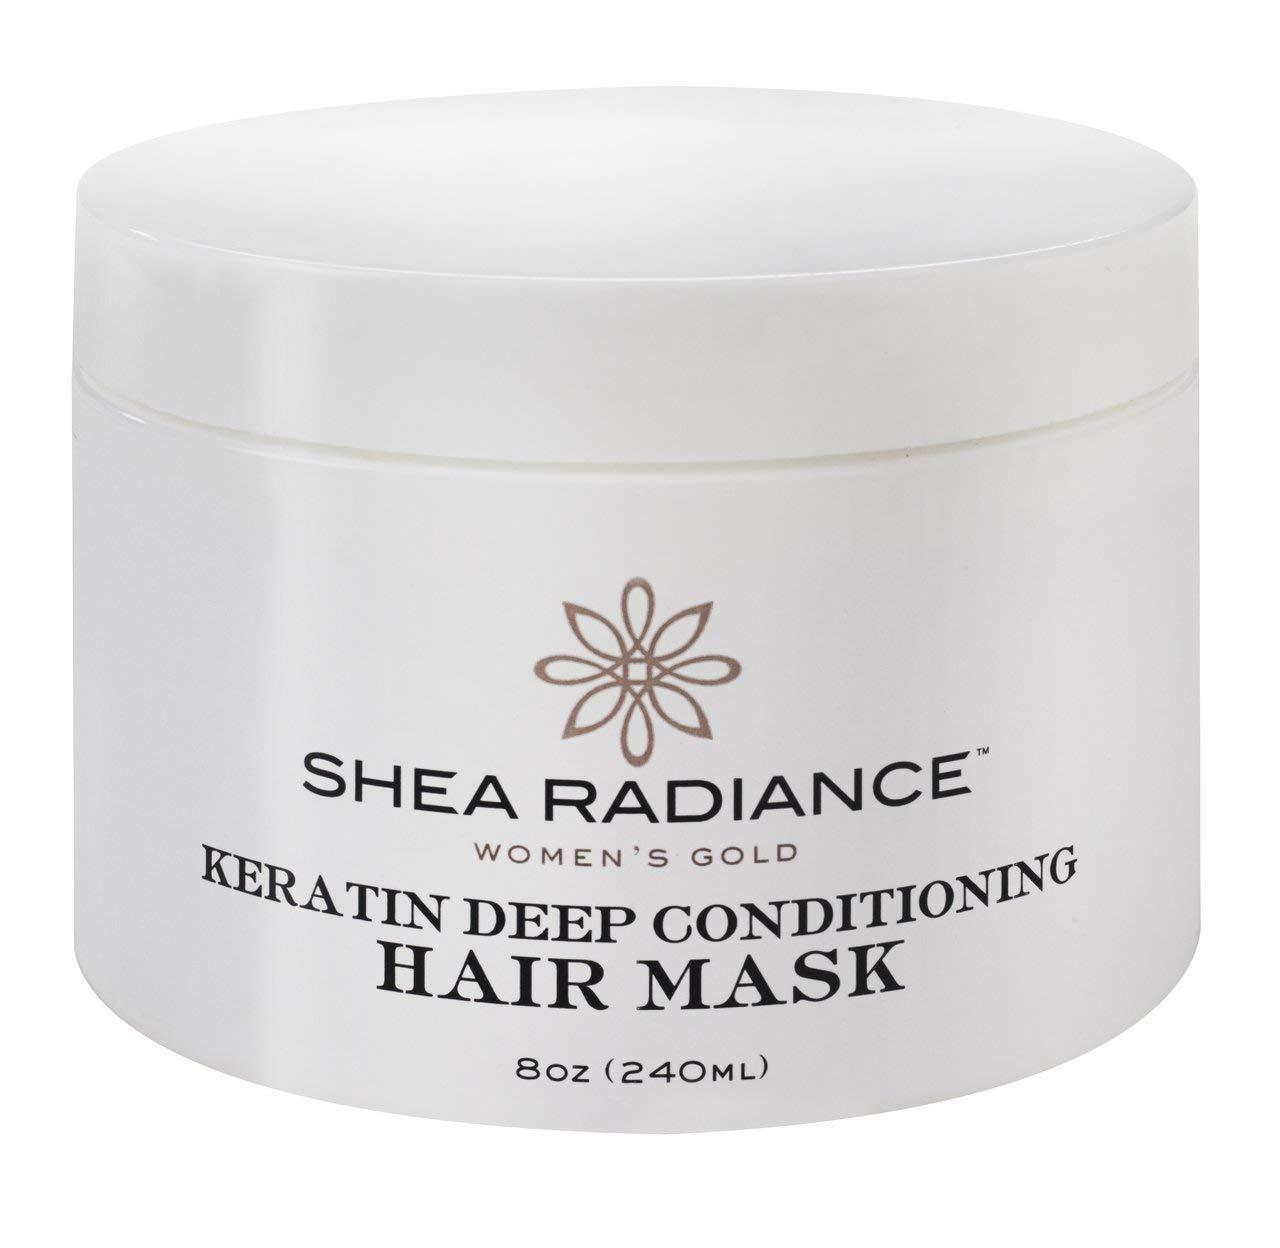 Shea Radiance Keratin Deep Conditioning Hair Mask Repair Treatment For Dry Damaged Hair| 8 oz